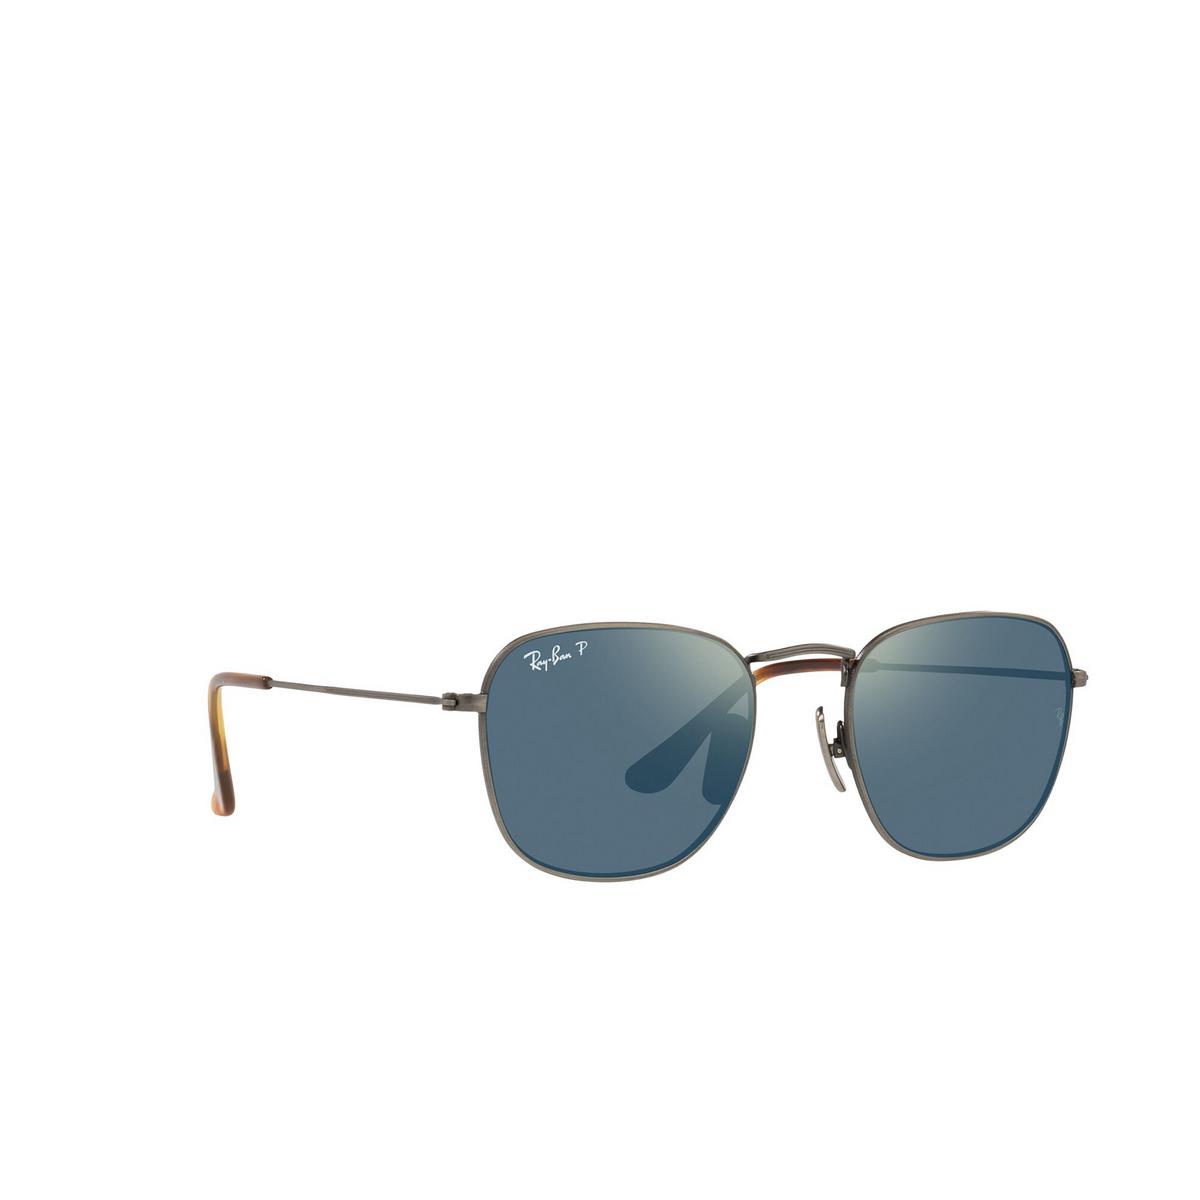 Ray-Ban® Square Sunglasses: Frank RB8157 color Demigloss Gunmetal 9208T0 - three-quarters view.